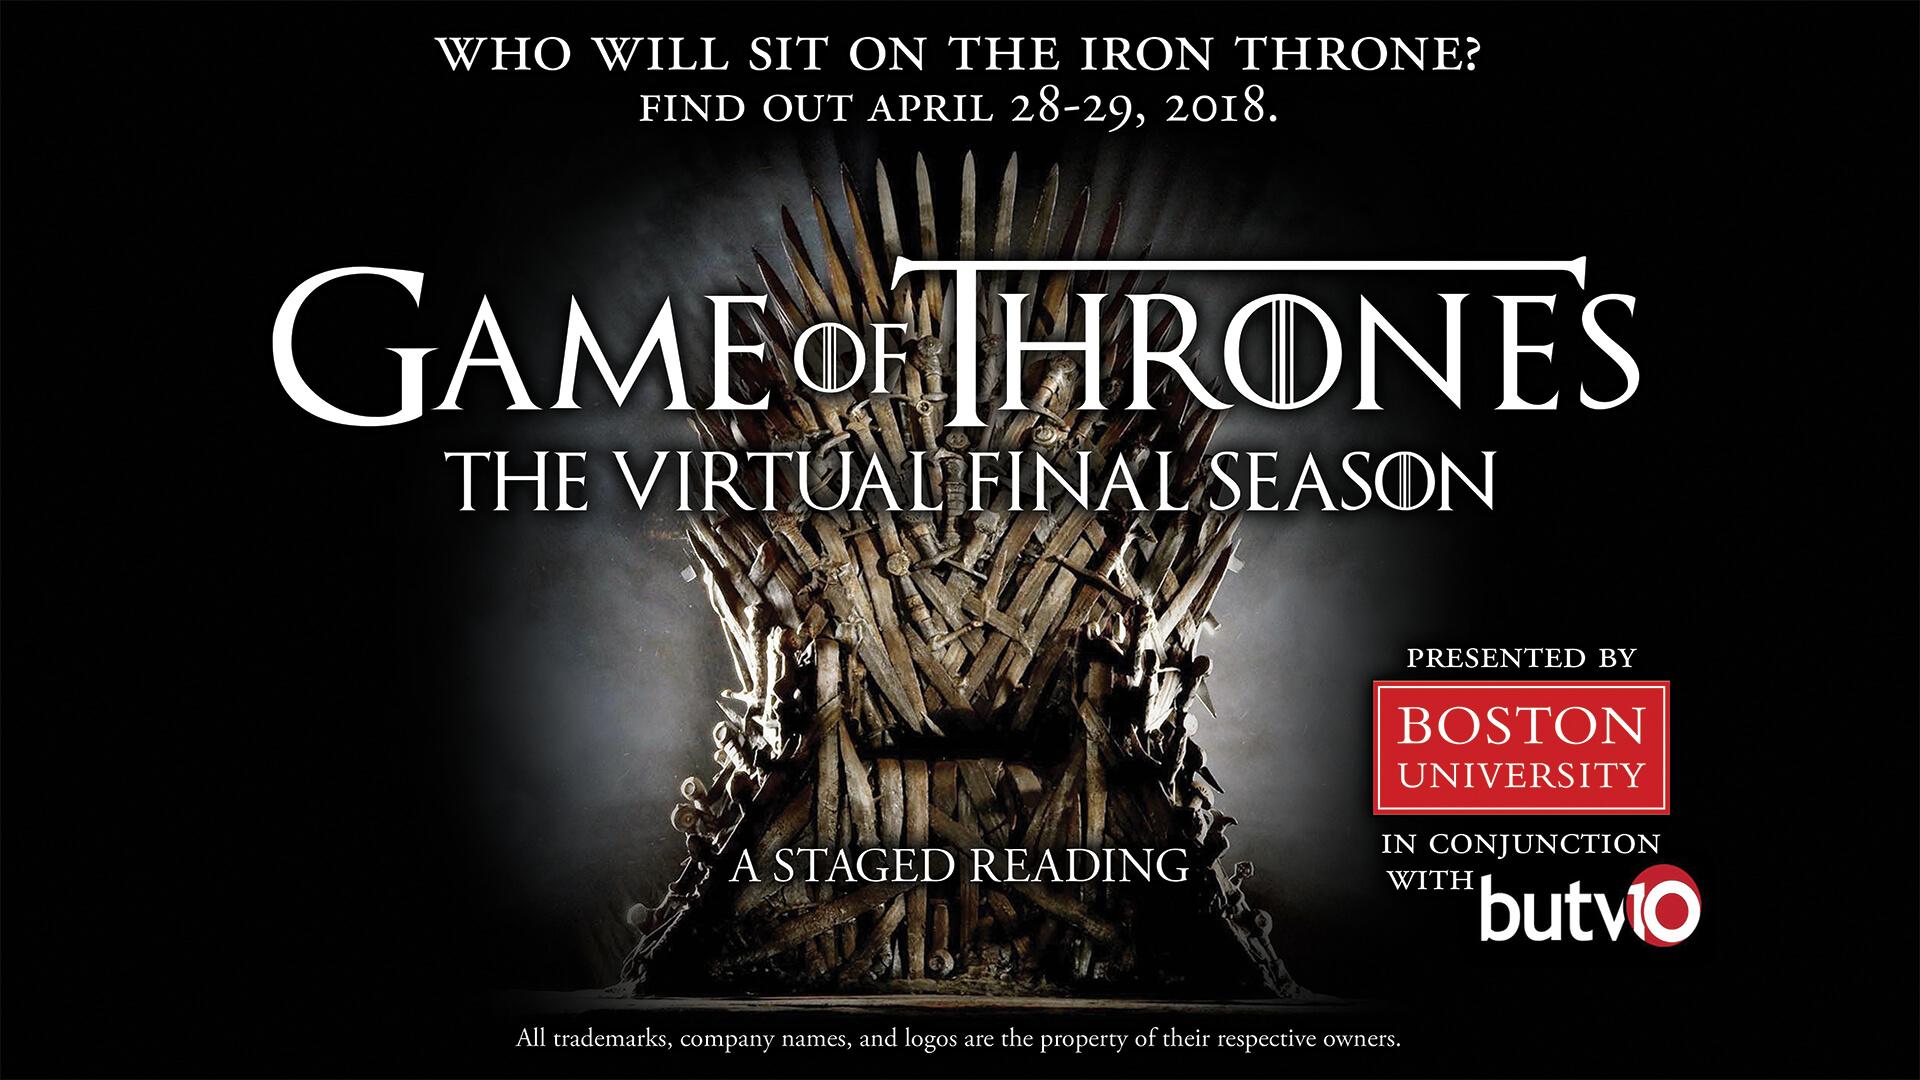 Scripts Game Of Thrones Season 8 From Boston University